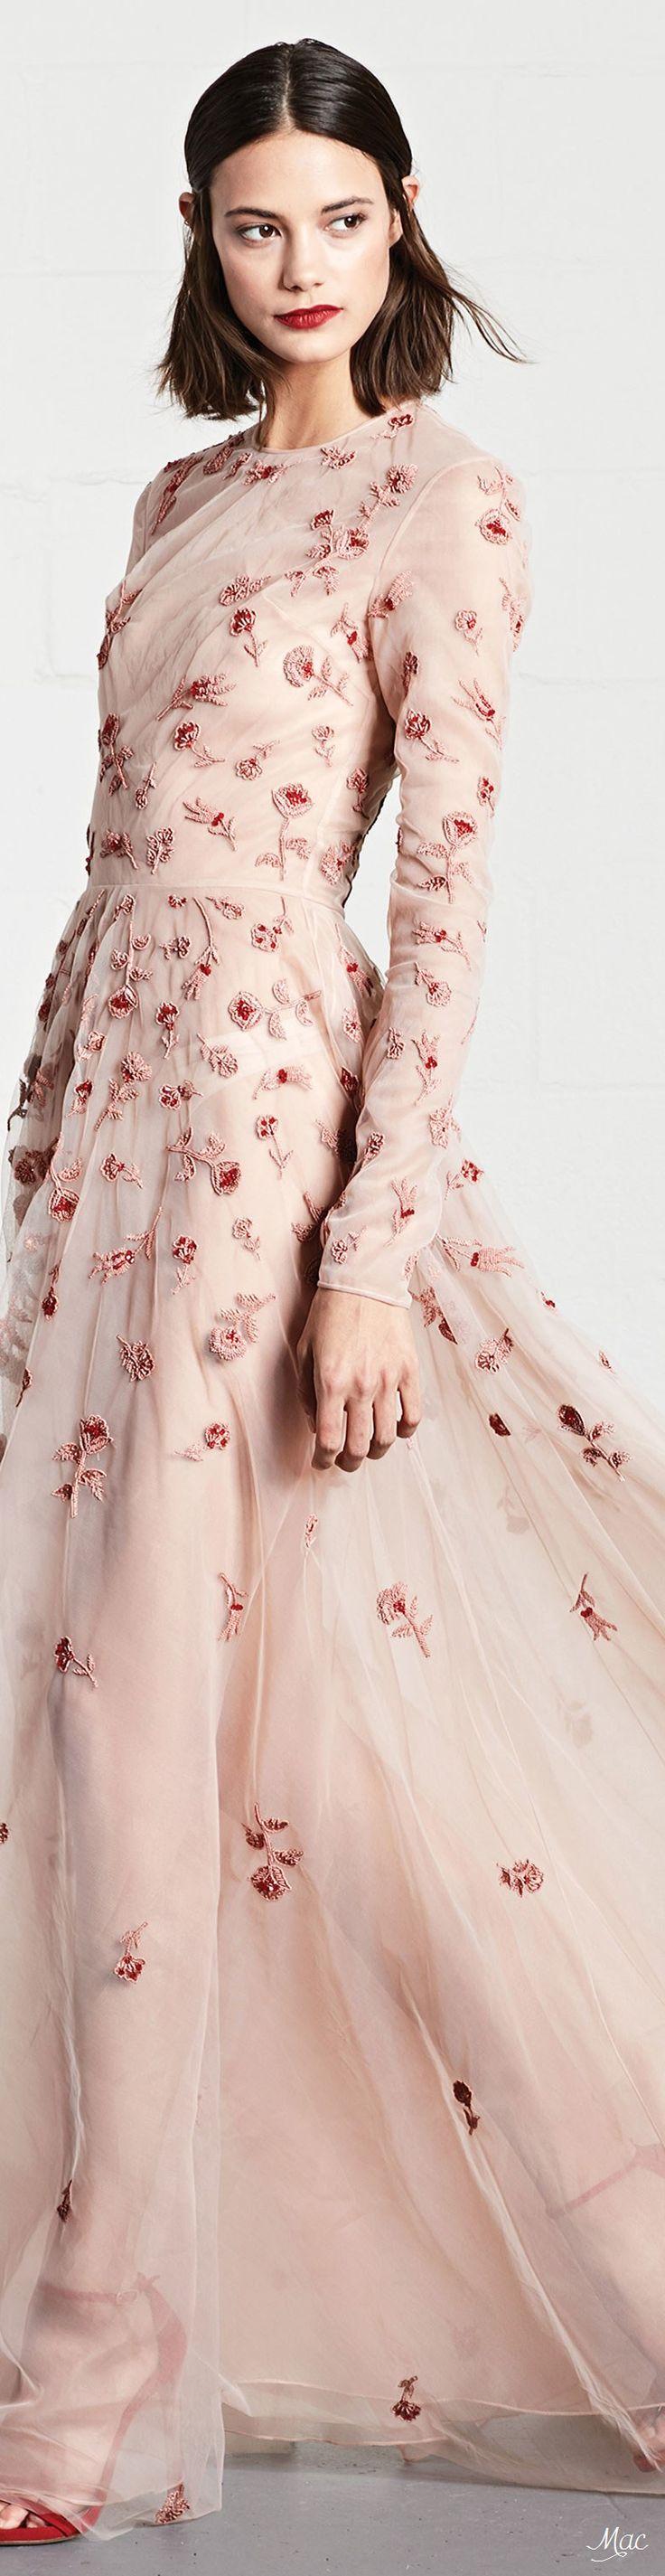 Resort 2018 Dennis Basso, high neck, long sleeve, evening, dress, gown, floor, a-line, ethereal, blush, pink, embellished, beaded